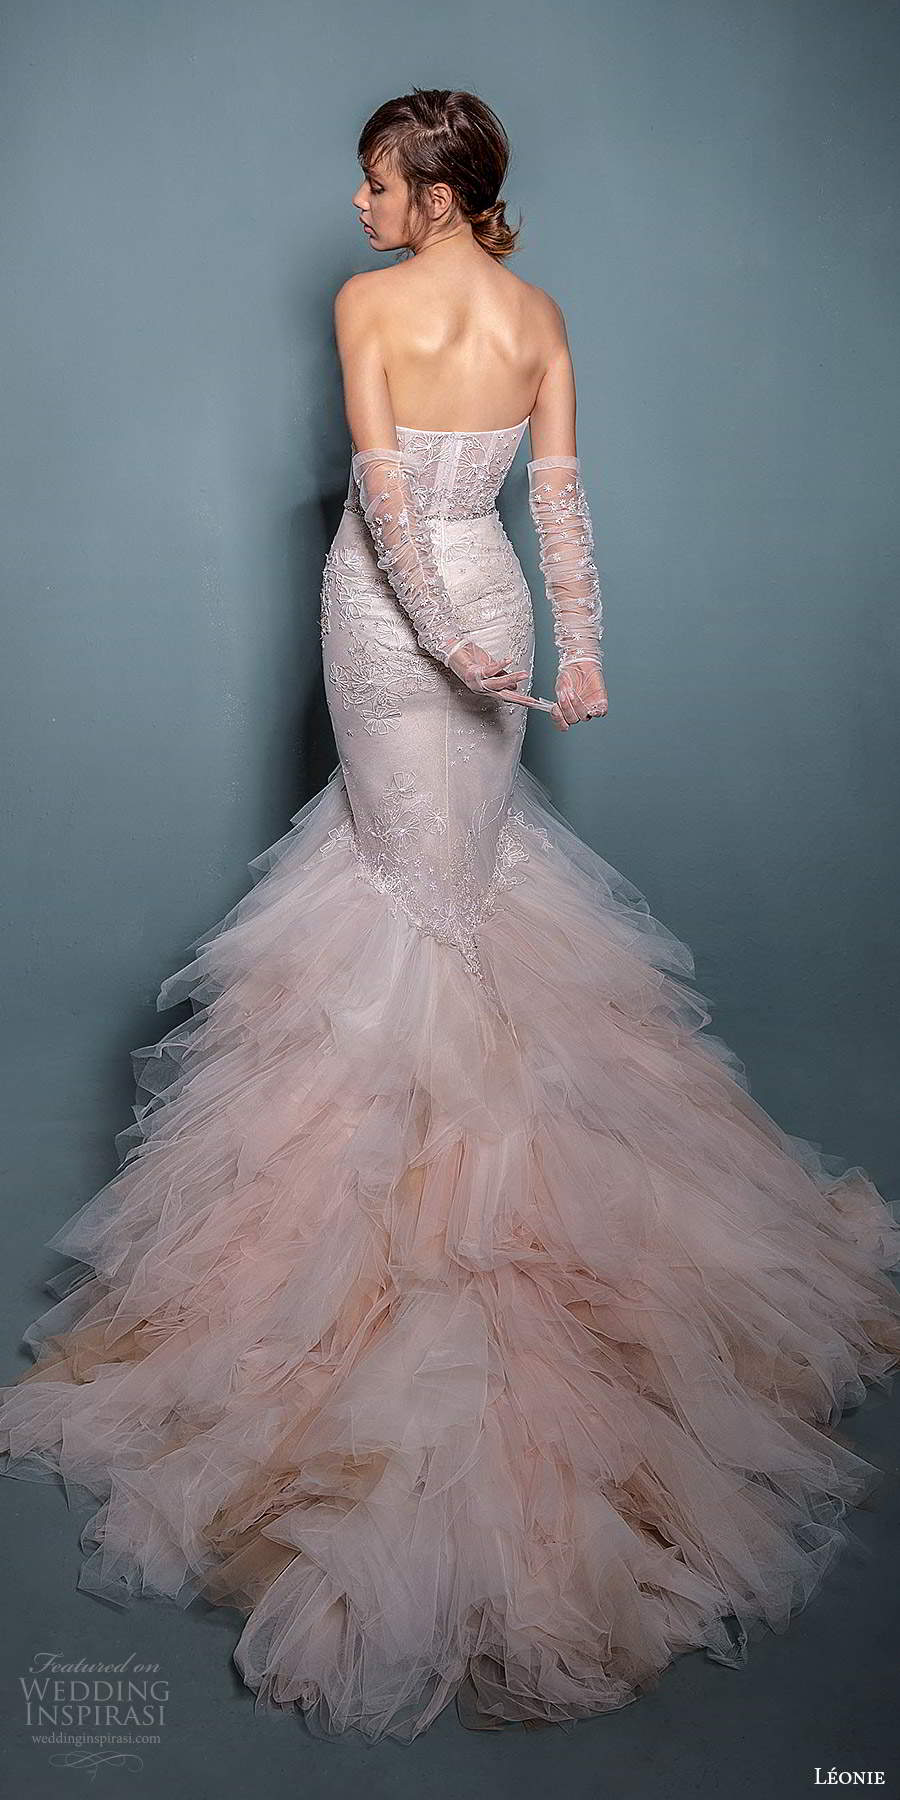 leonie bridal 2020 bridal strapless sweetheart neckline embellished fit flare mermaid wedding dress chapel train gloves (3) bv